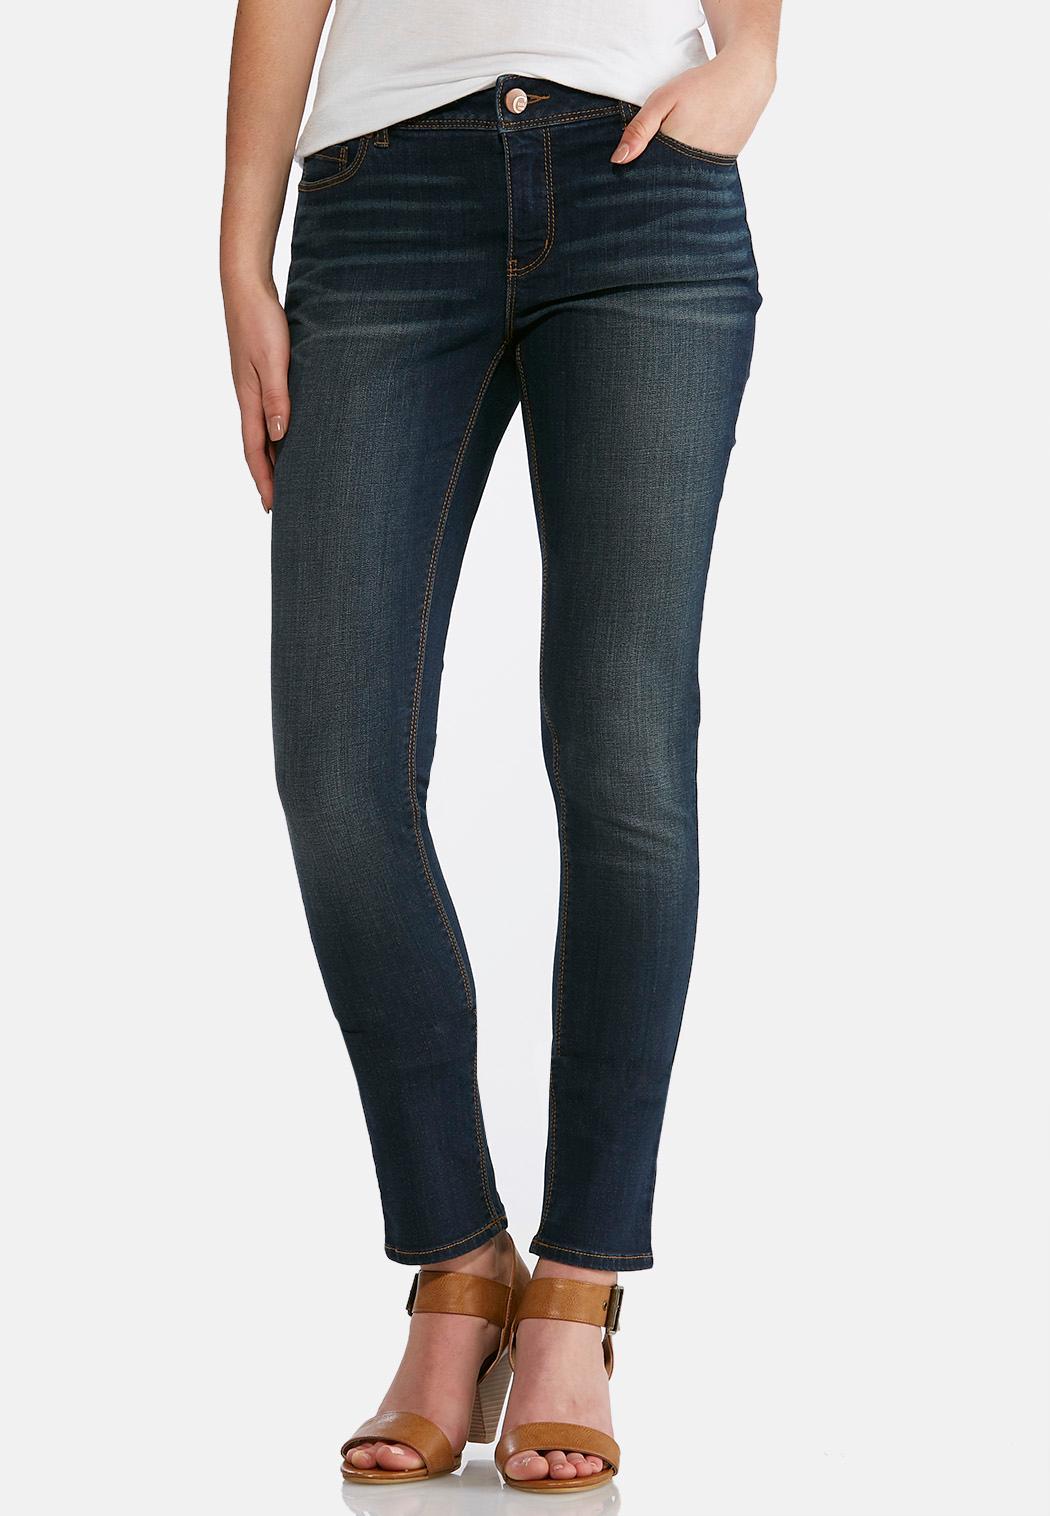 Rinse Wash Skinny Jeans